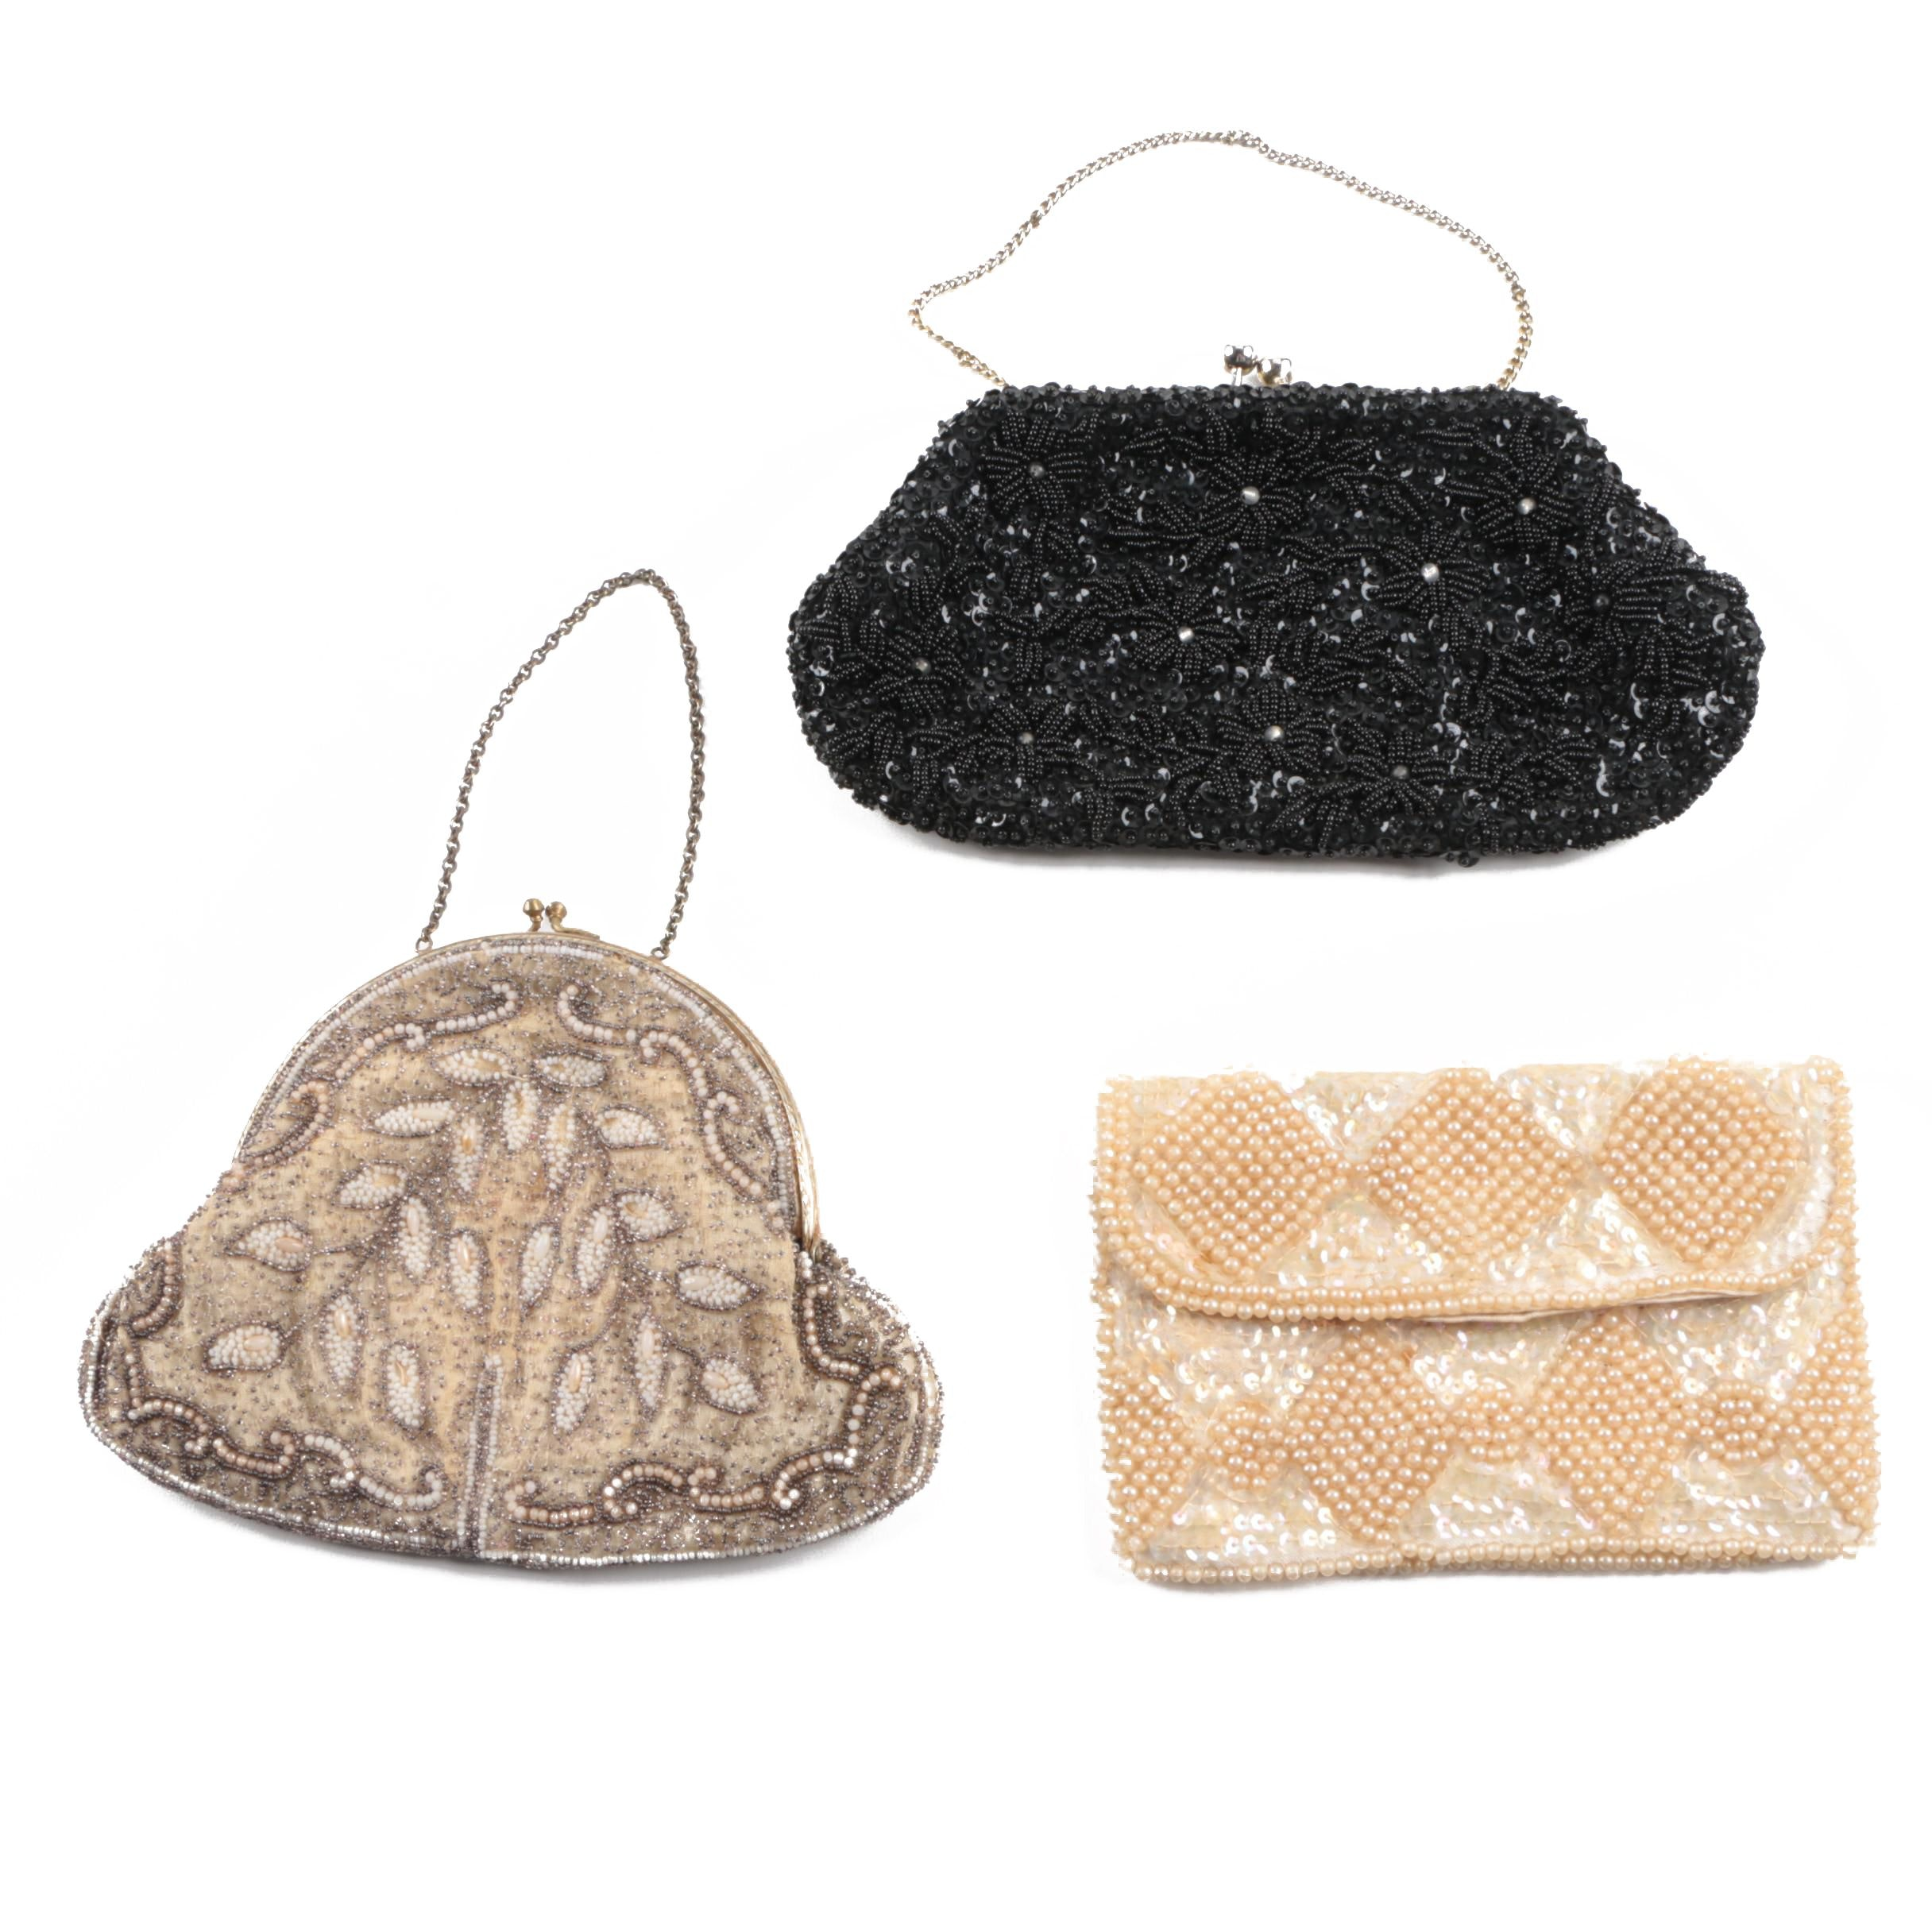 Circa 1950s Vintage Embellished Occasion Handbags